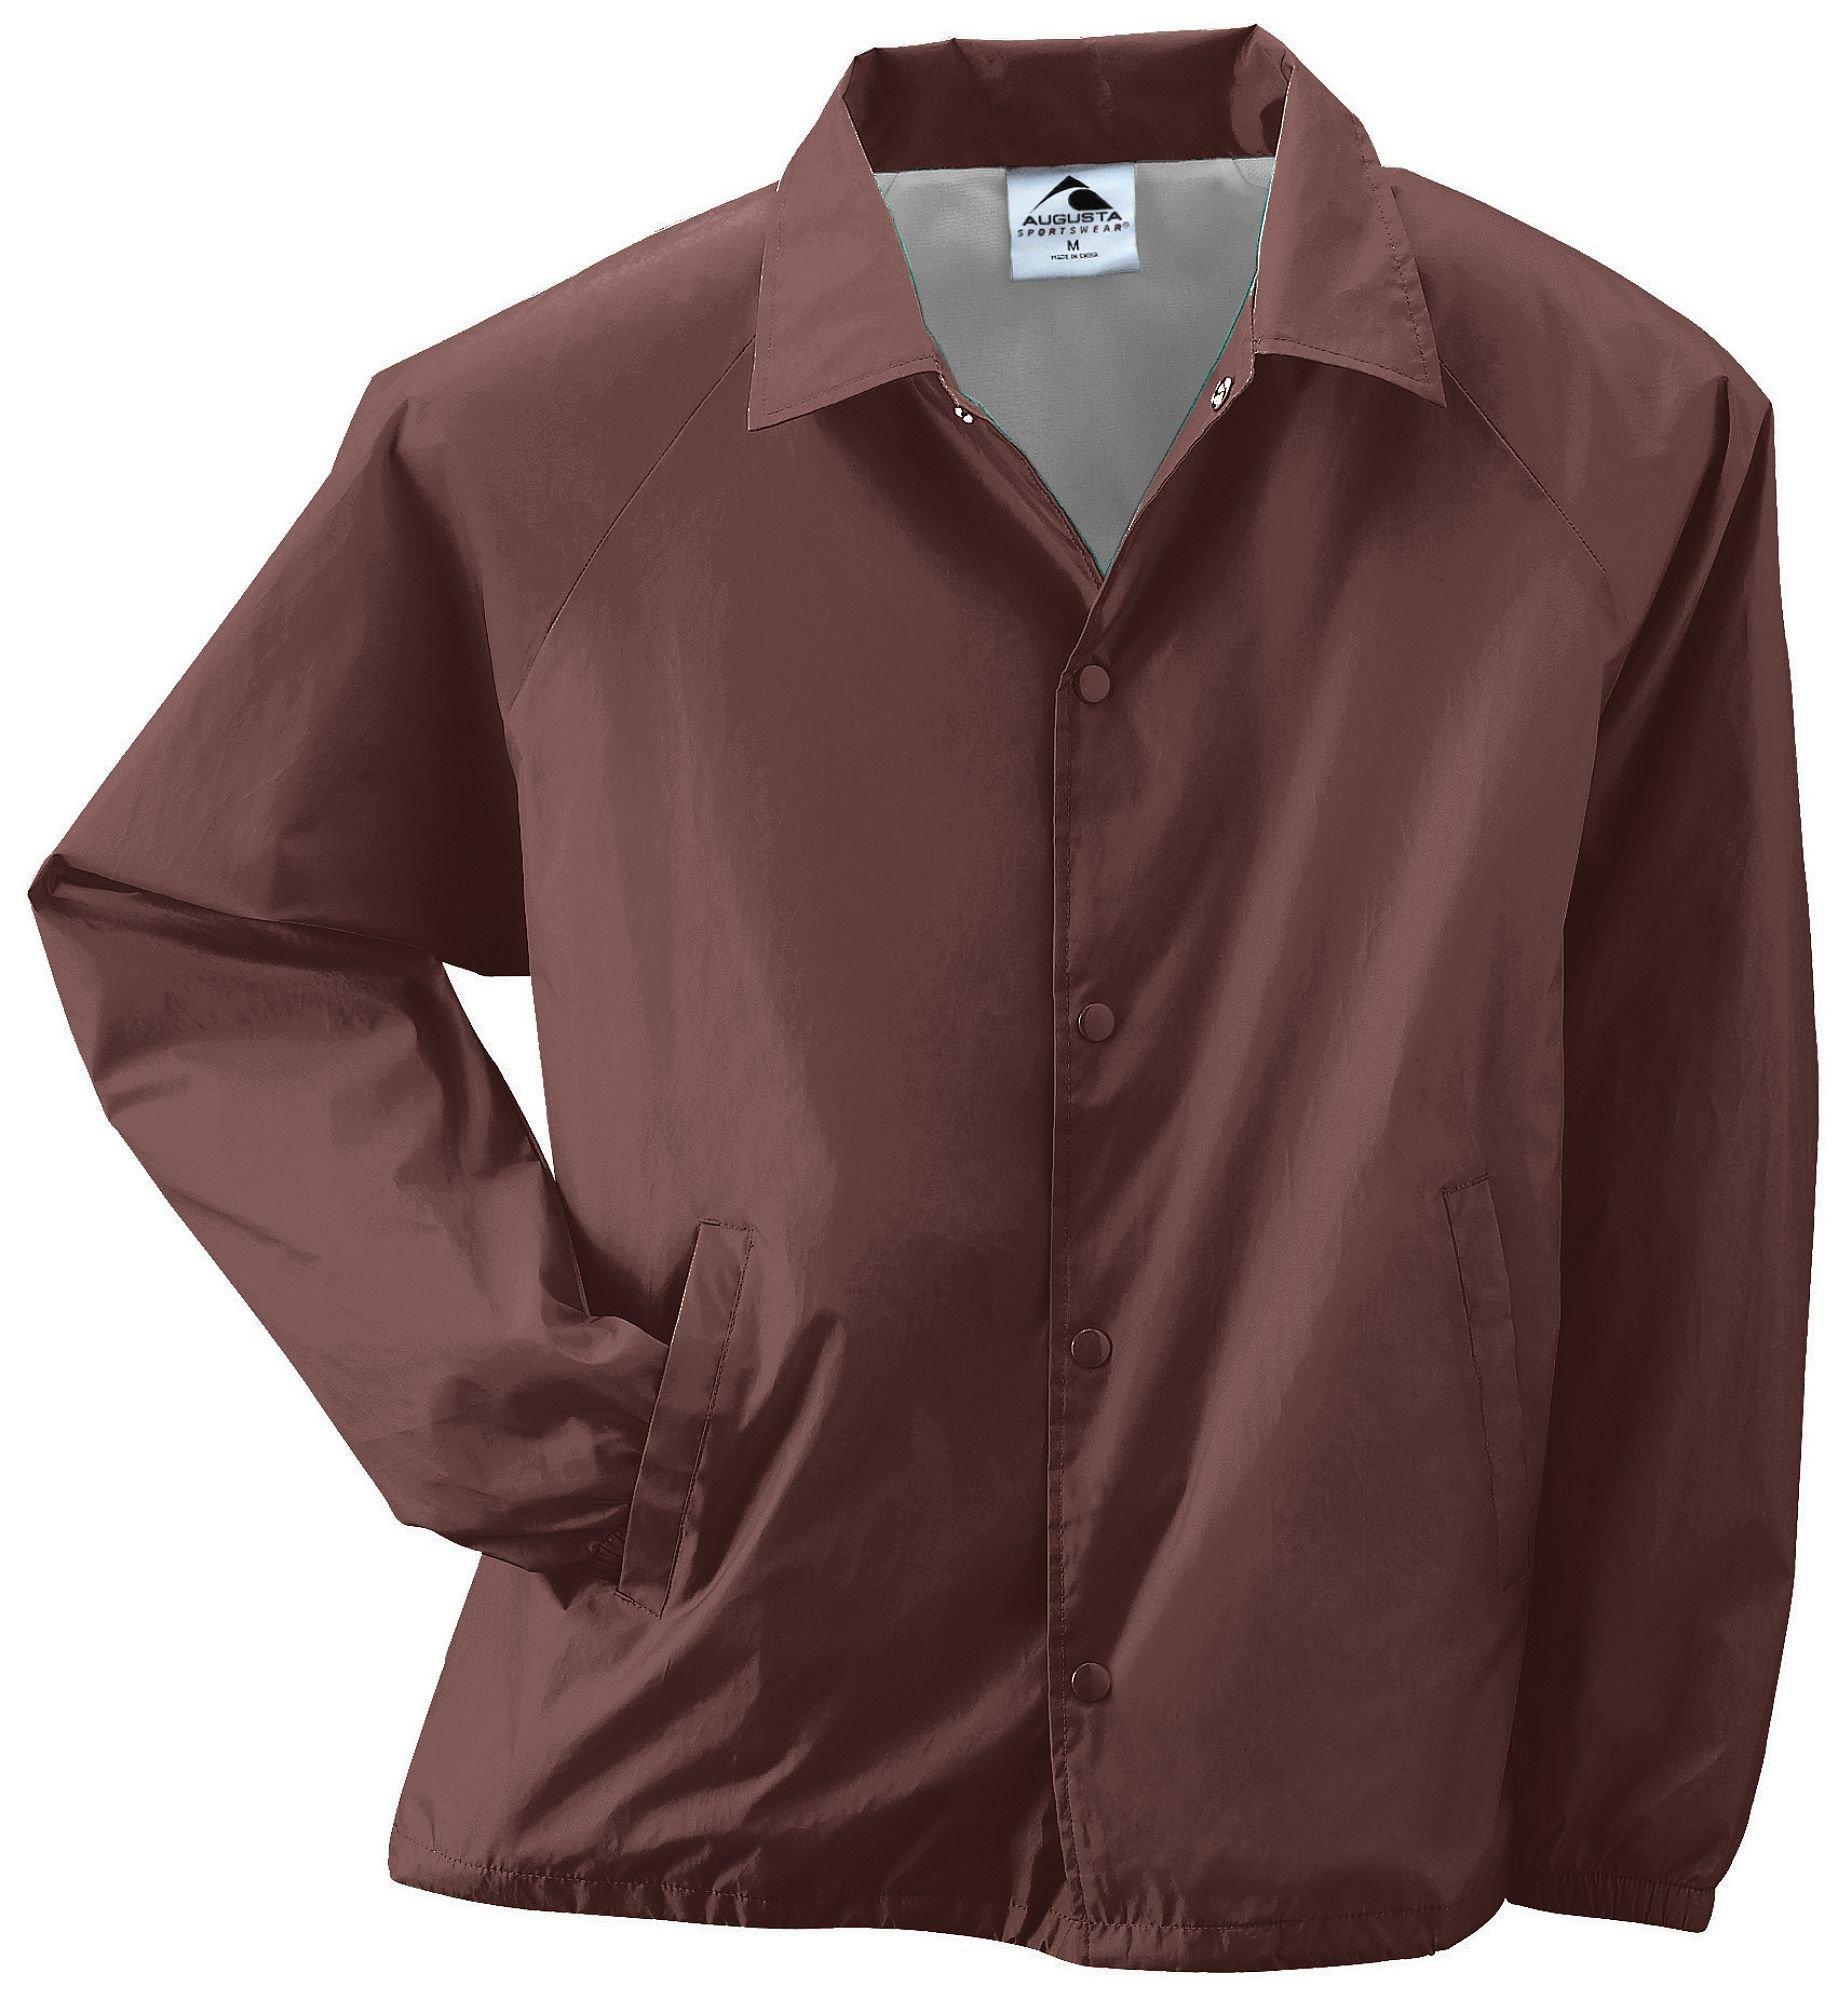 Augusta Sportswear Nylon Coach's Jacket/Lined, 3X-Large, Brown